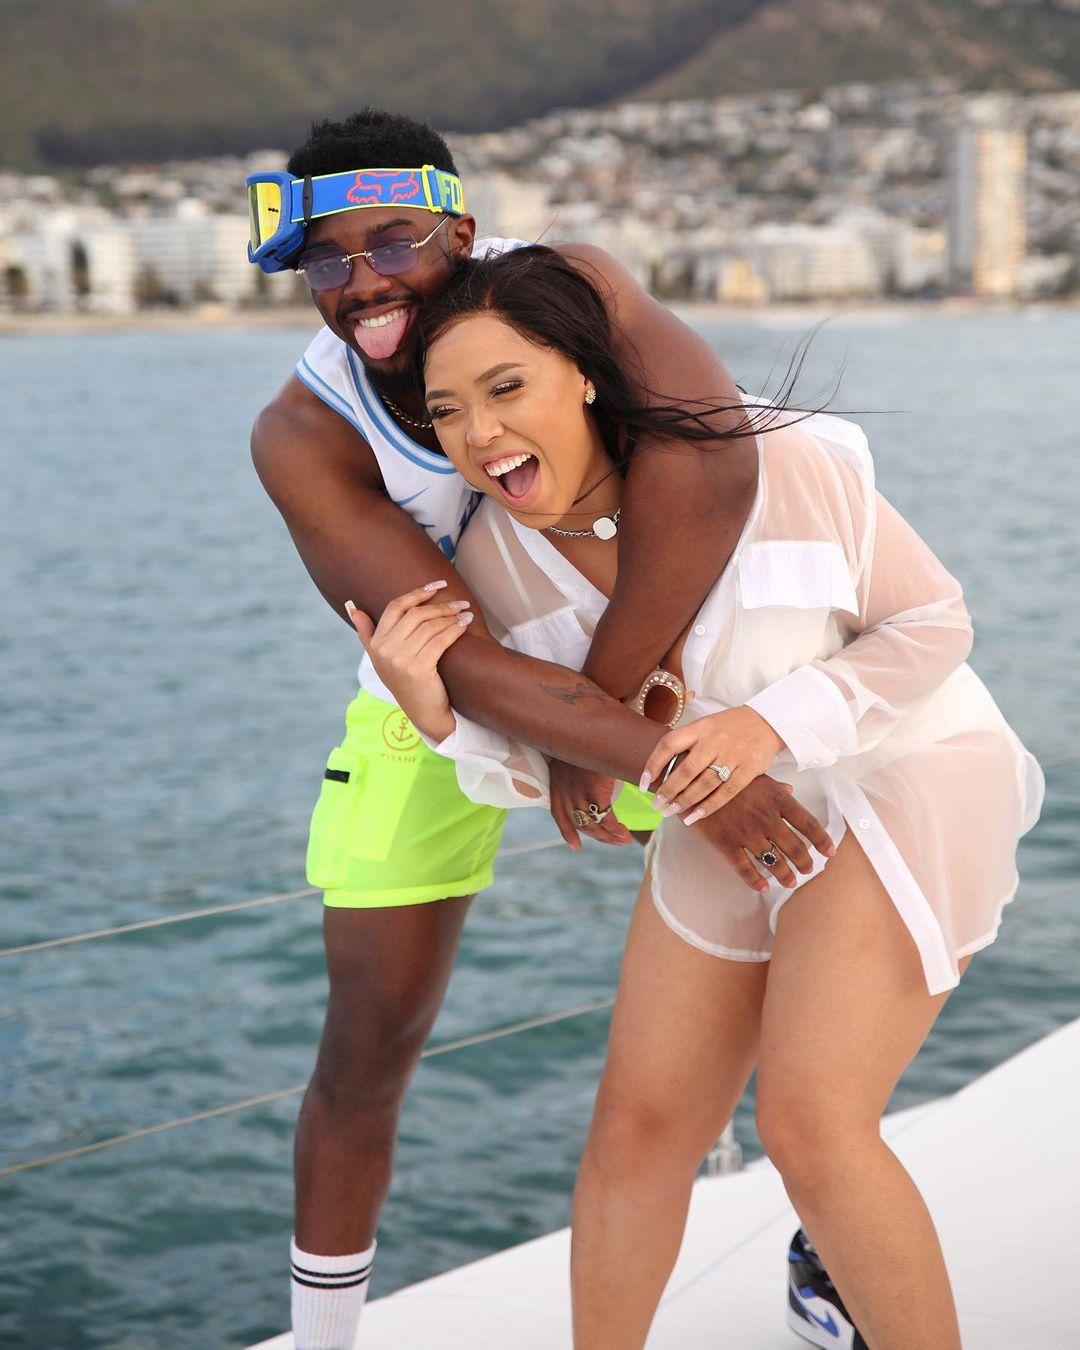 Mzansi react to Simz Ngema And Tino Chinyani breakup